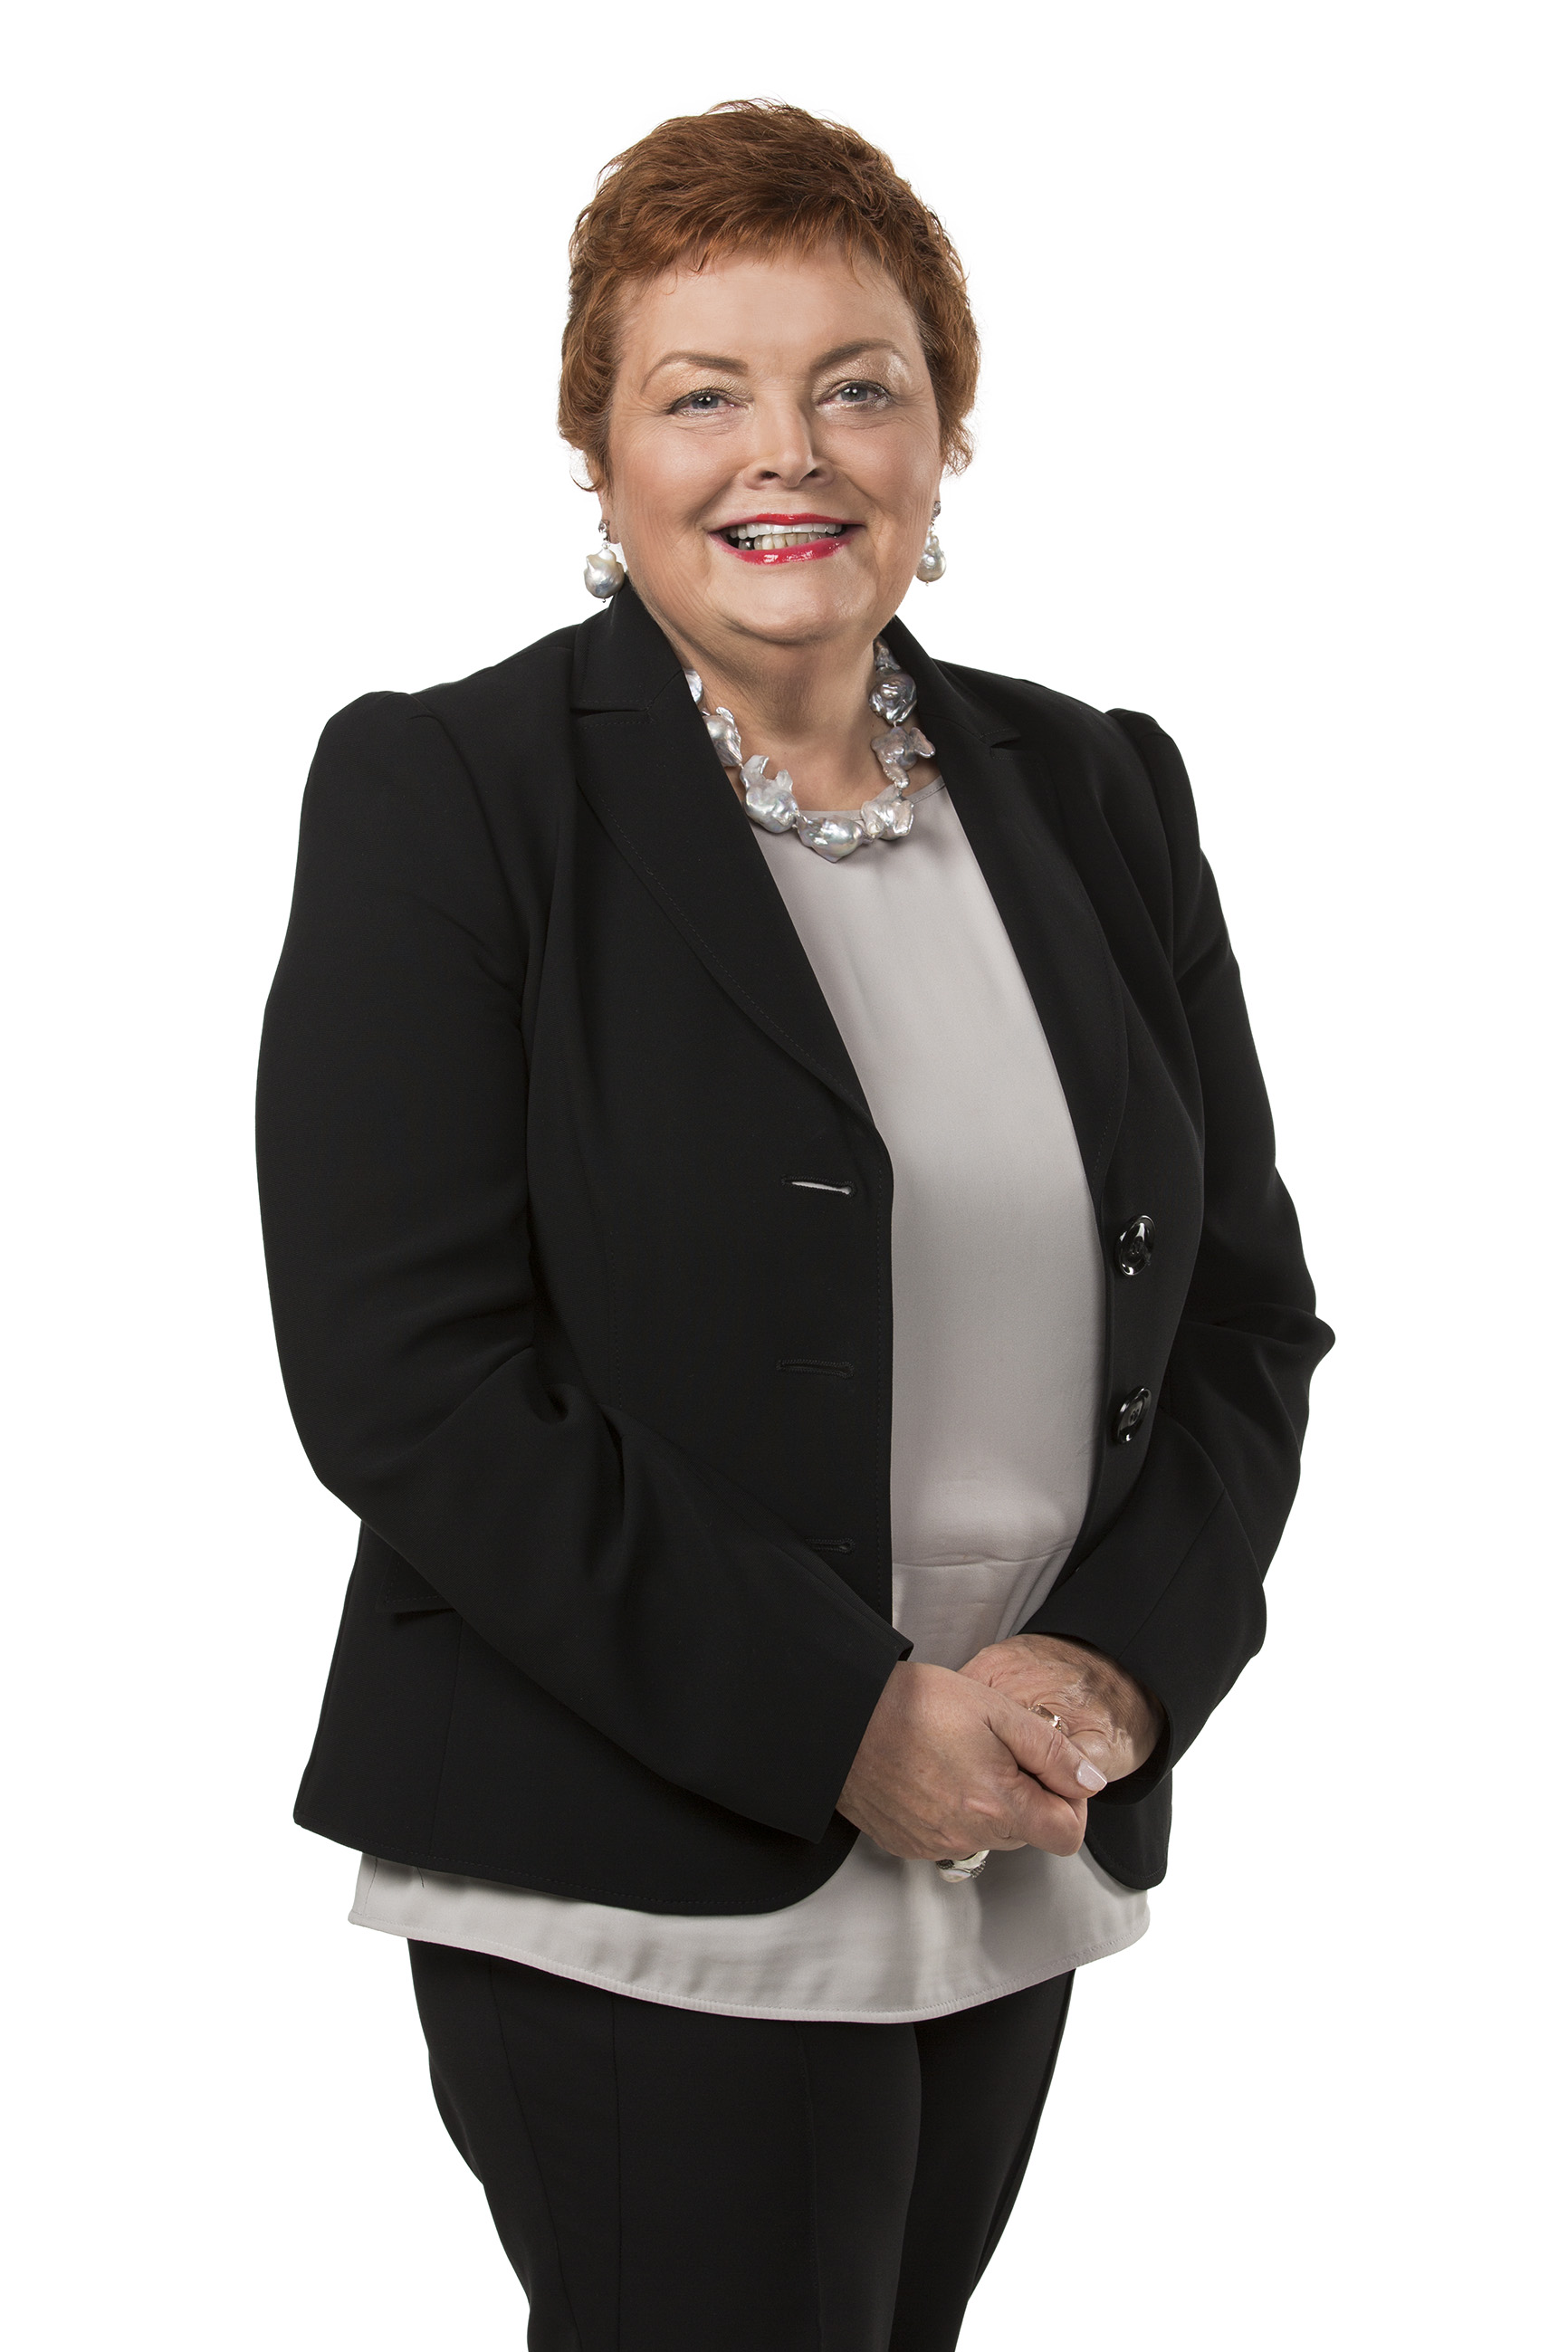 Anne O'Donoghue